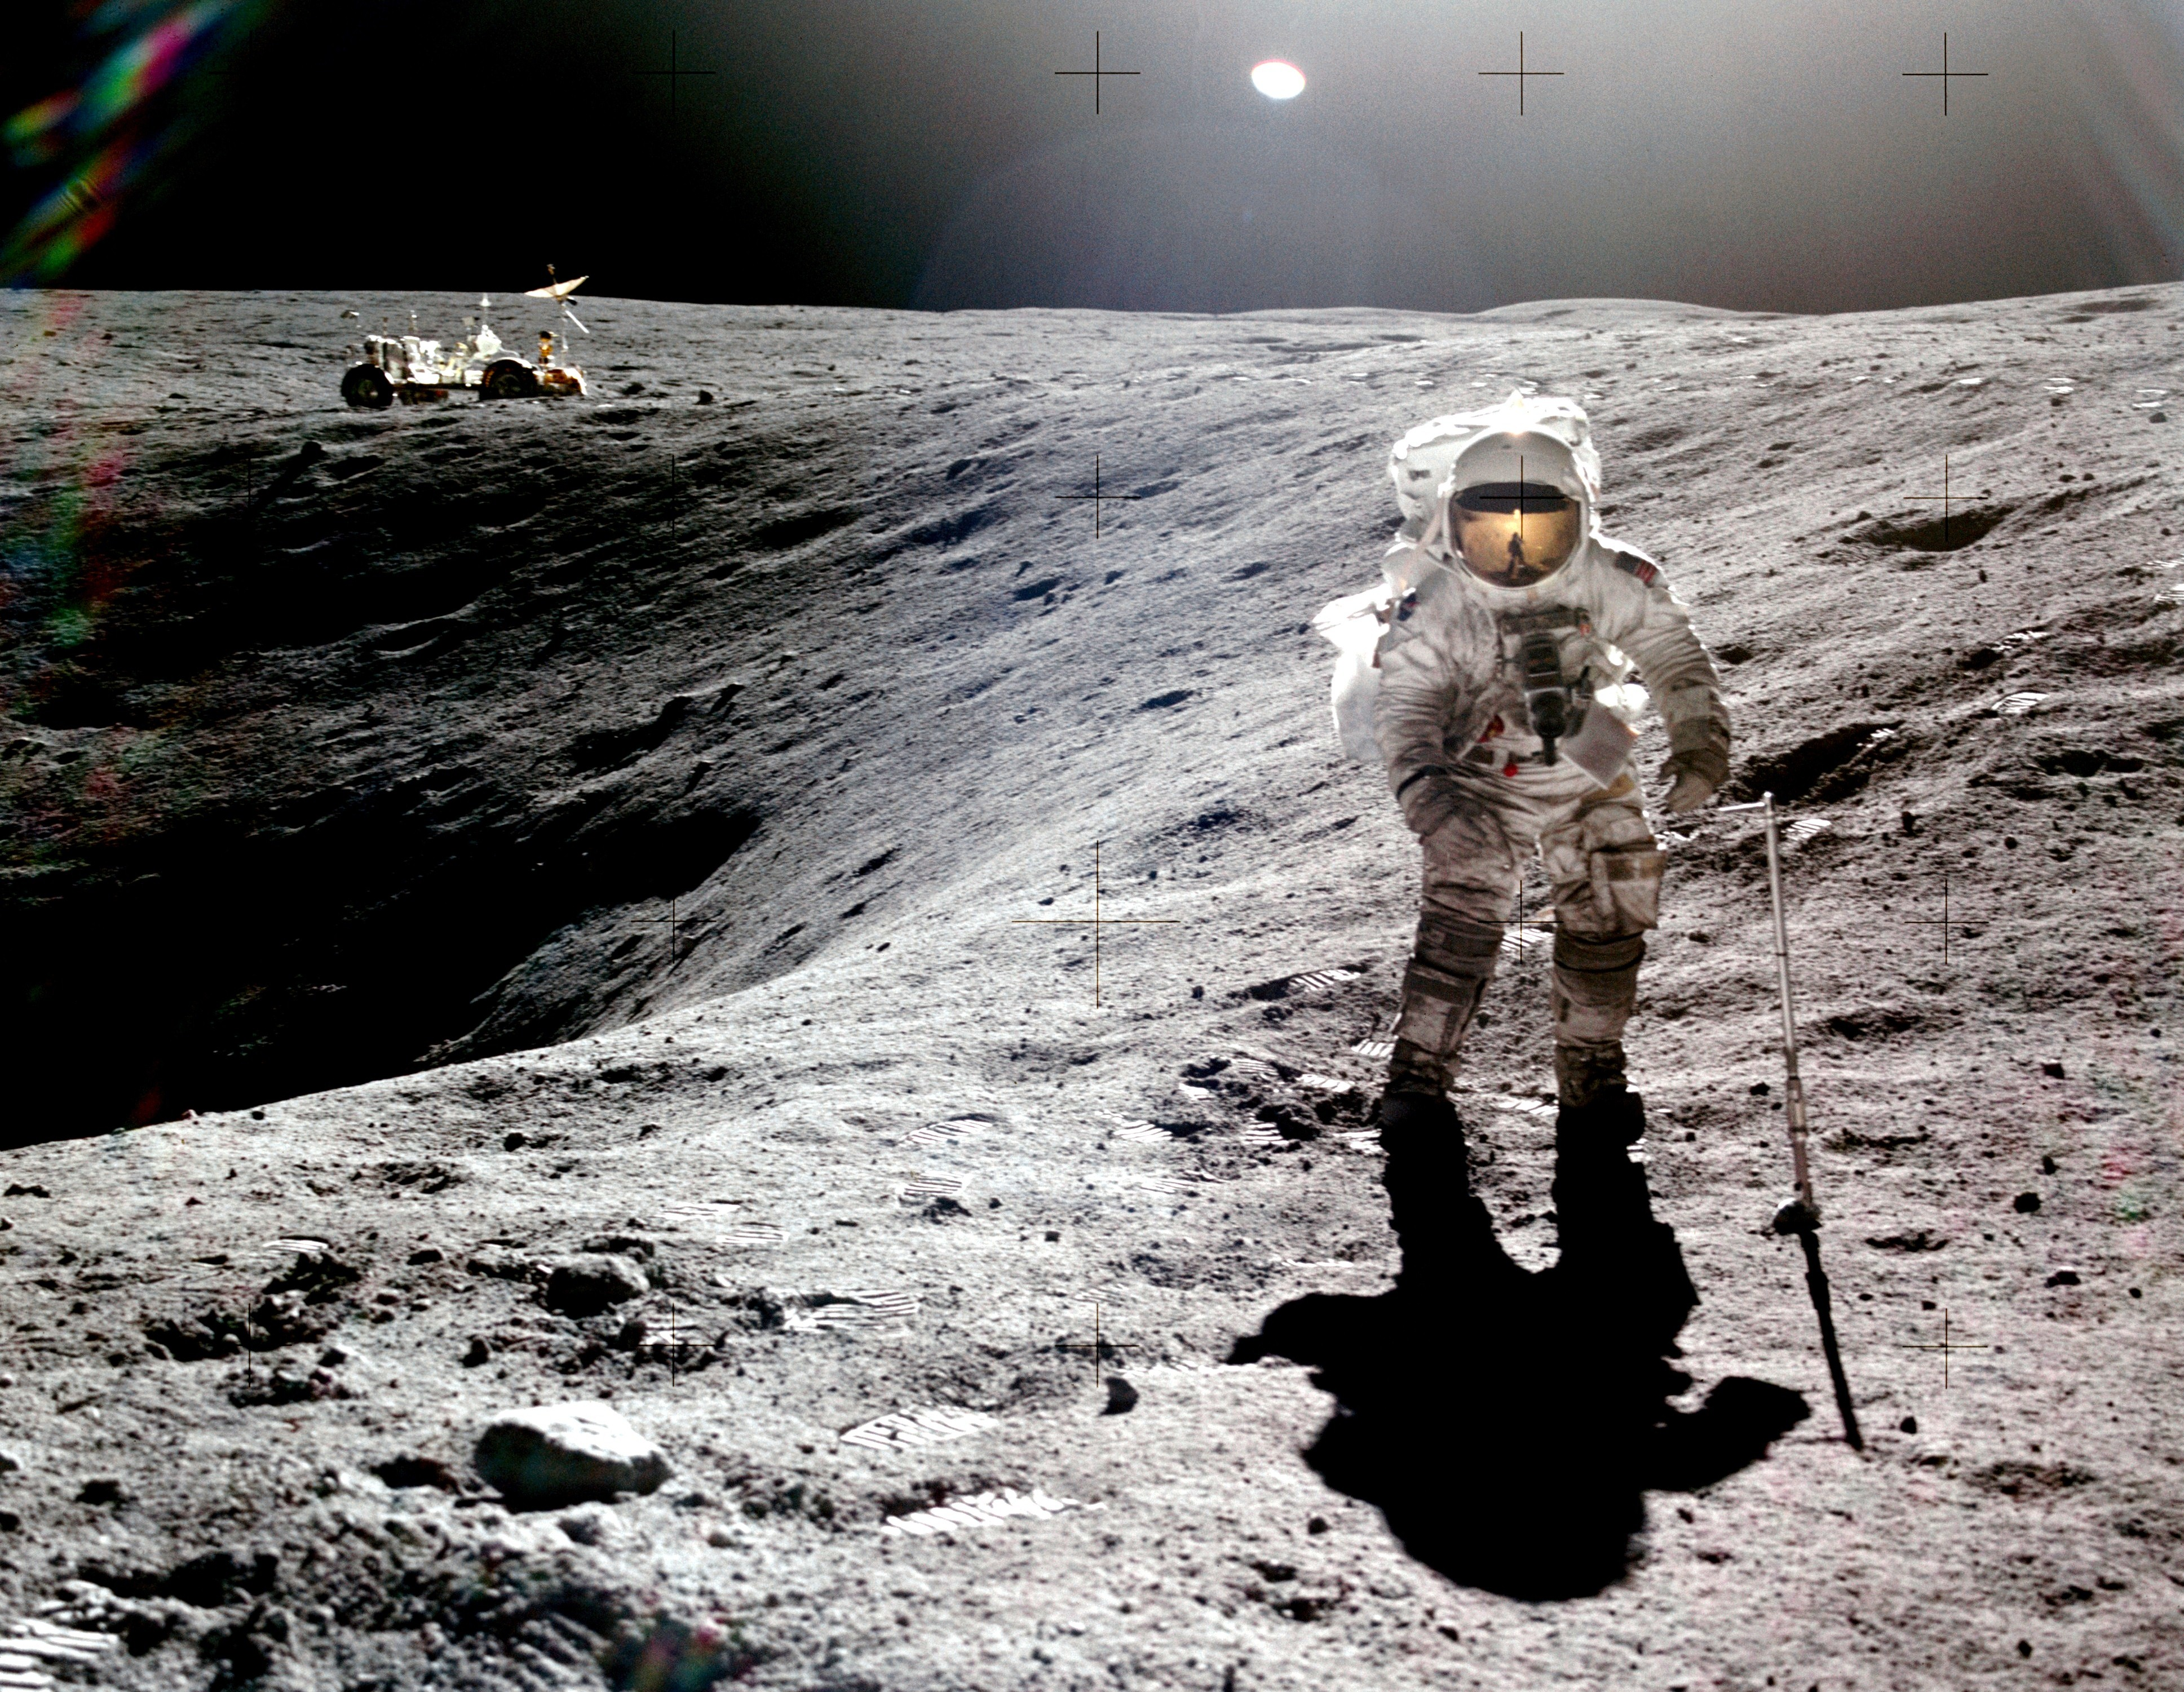 future moon exploration - photo #16